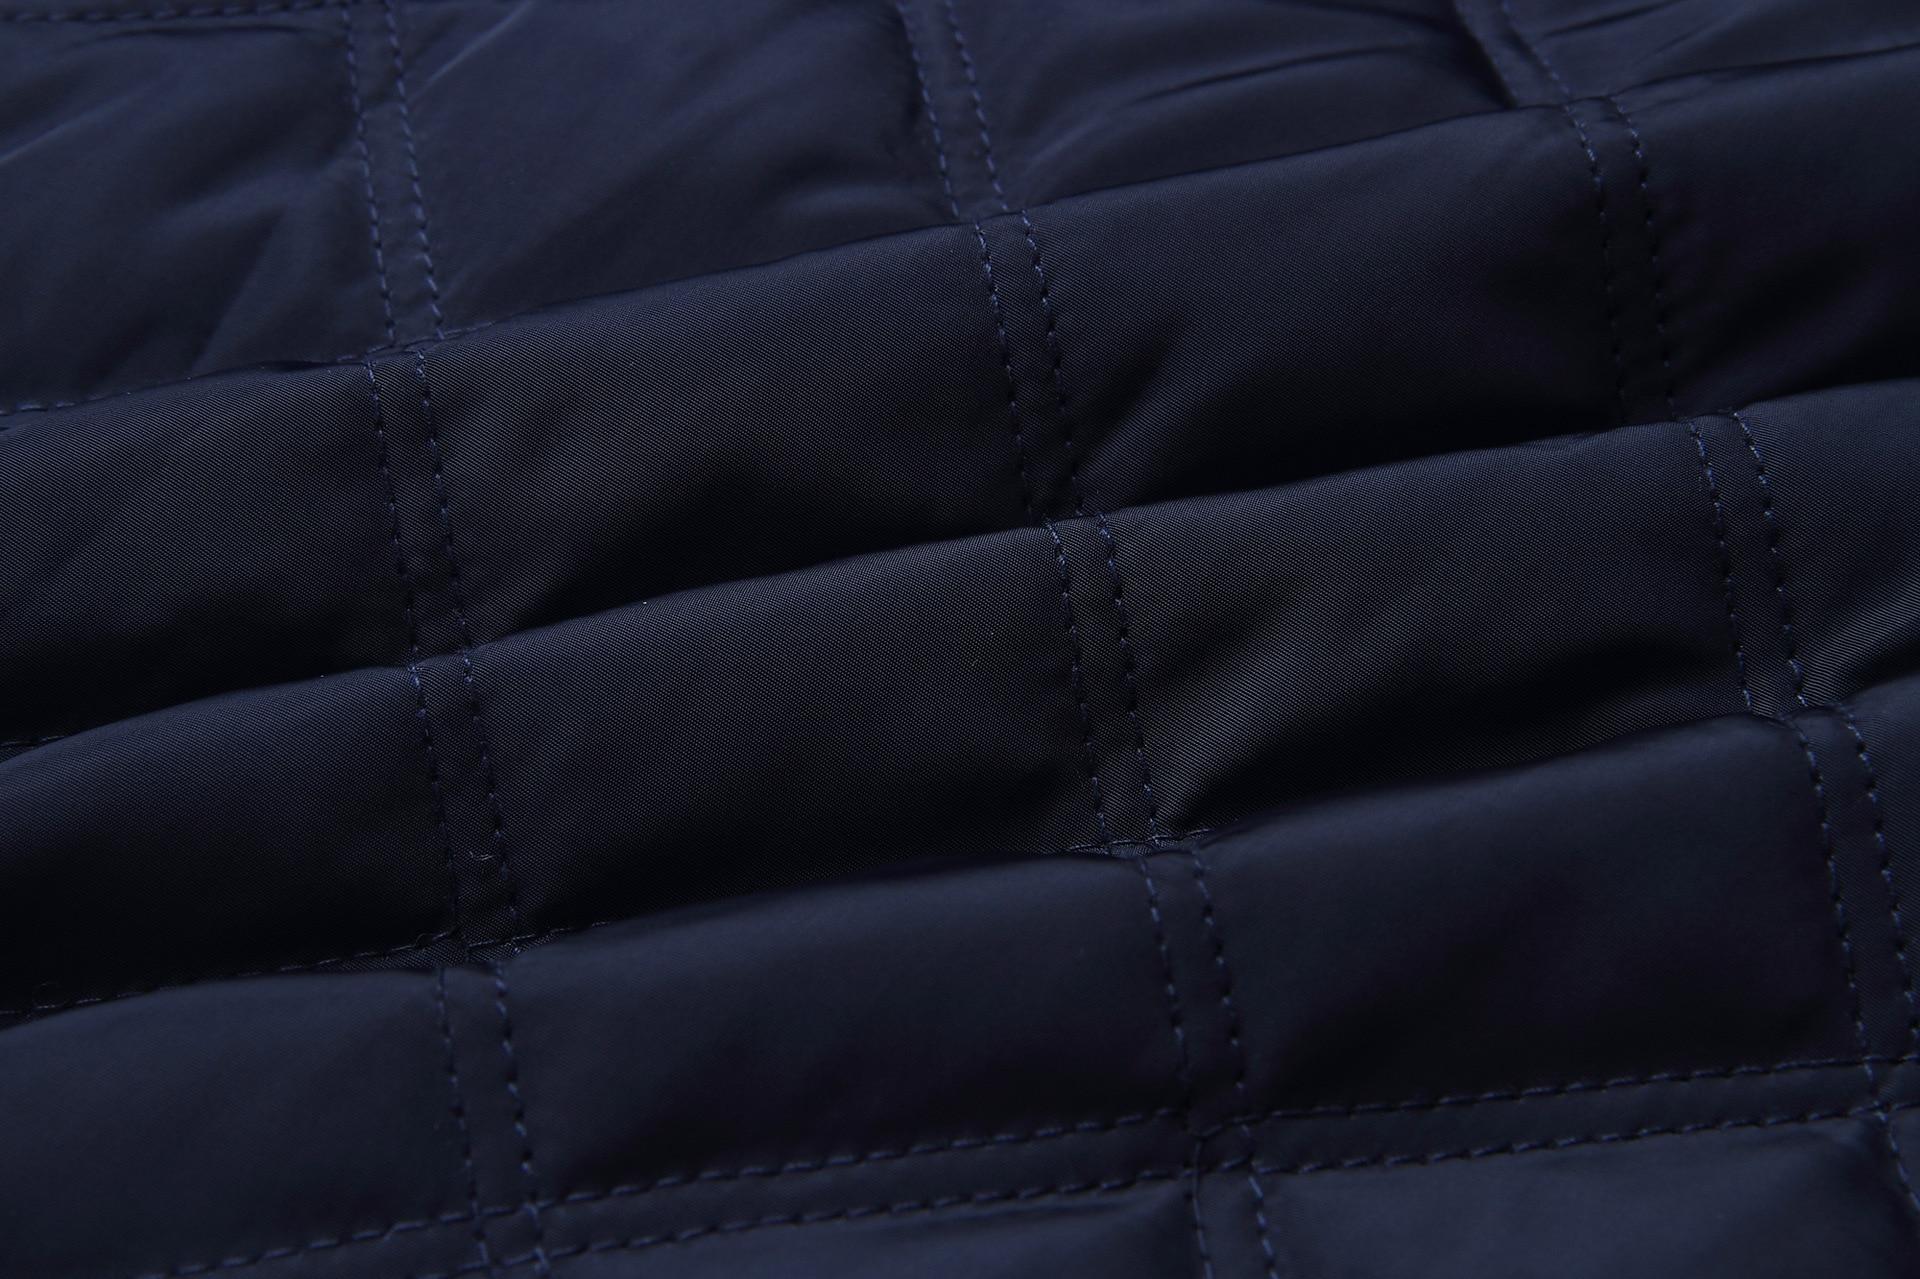 HTB1TbvEw3KTBuNkSne1q6yJoXXaT Plus Size Autumn Winter Fashion Slim Women's Jacket Zipper Cardigan Splice Bomber Jackets 2019 Long Sleeve Bodycon Coats Female